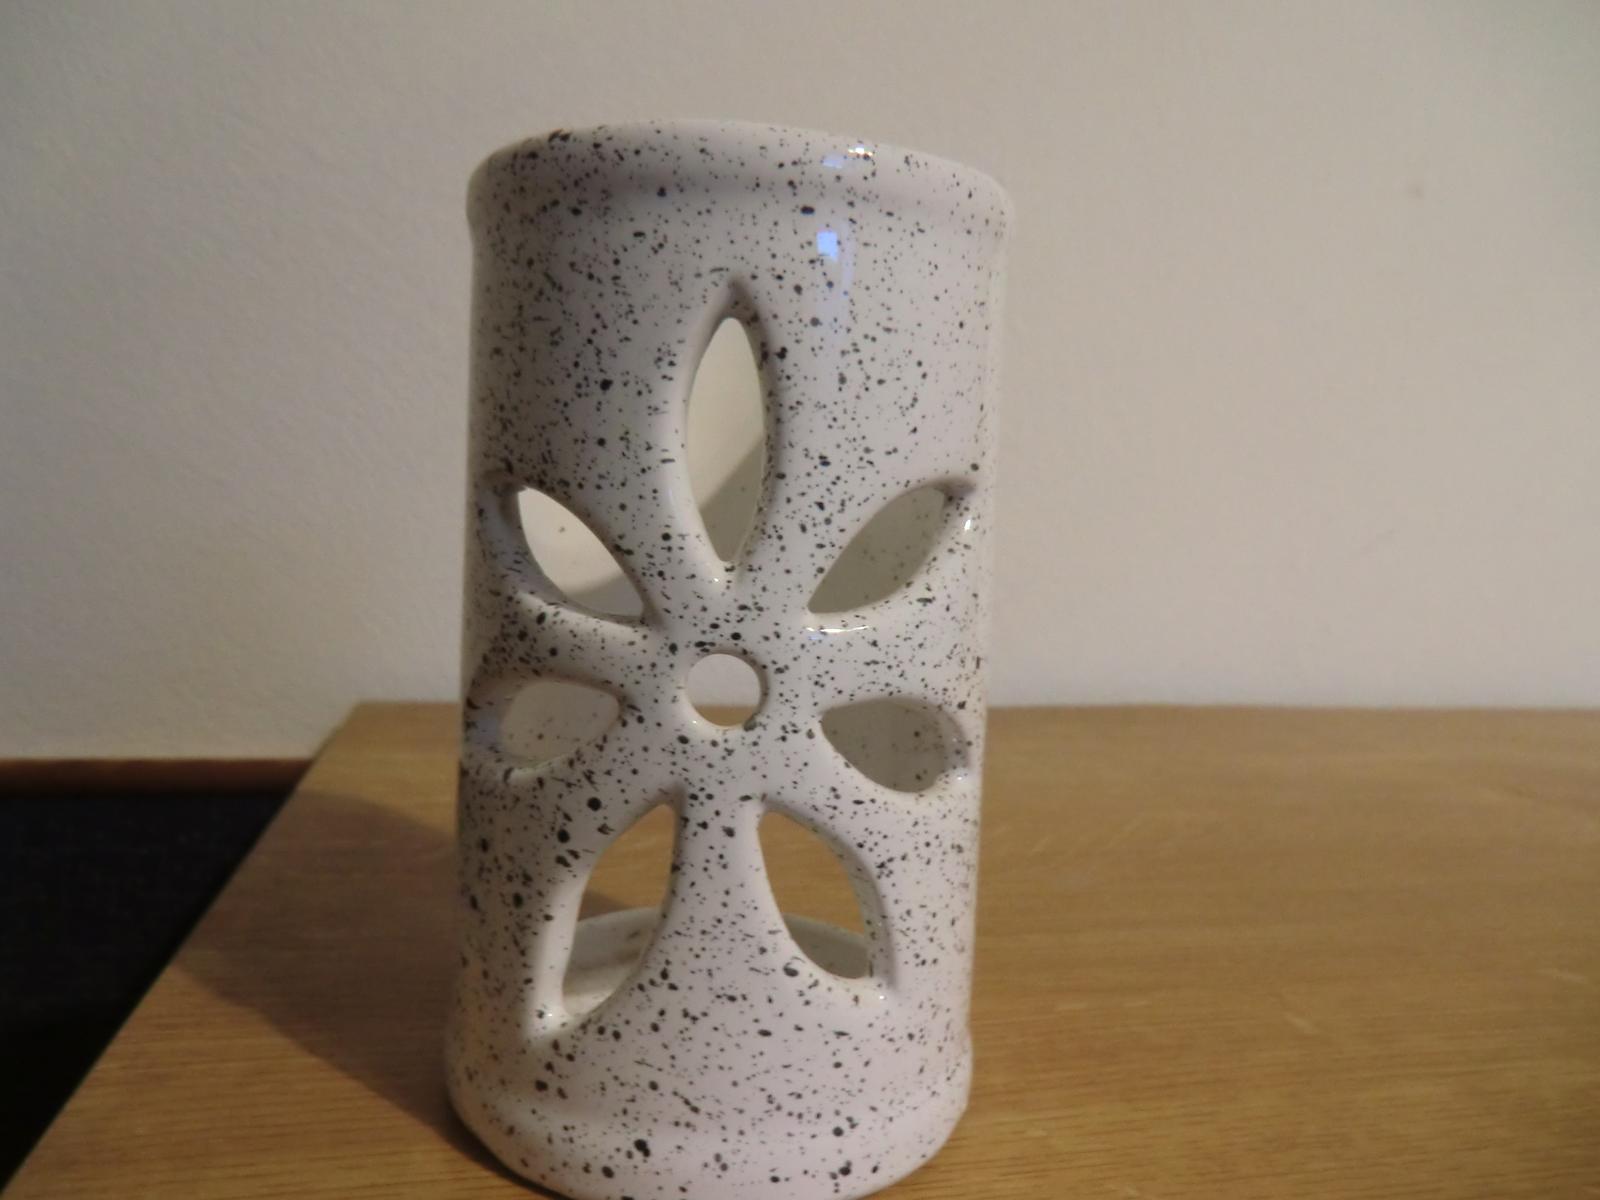 Svietnik na čajovú sviečku - Obrázok č. 1